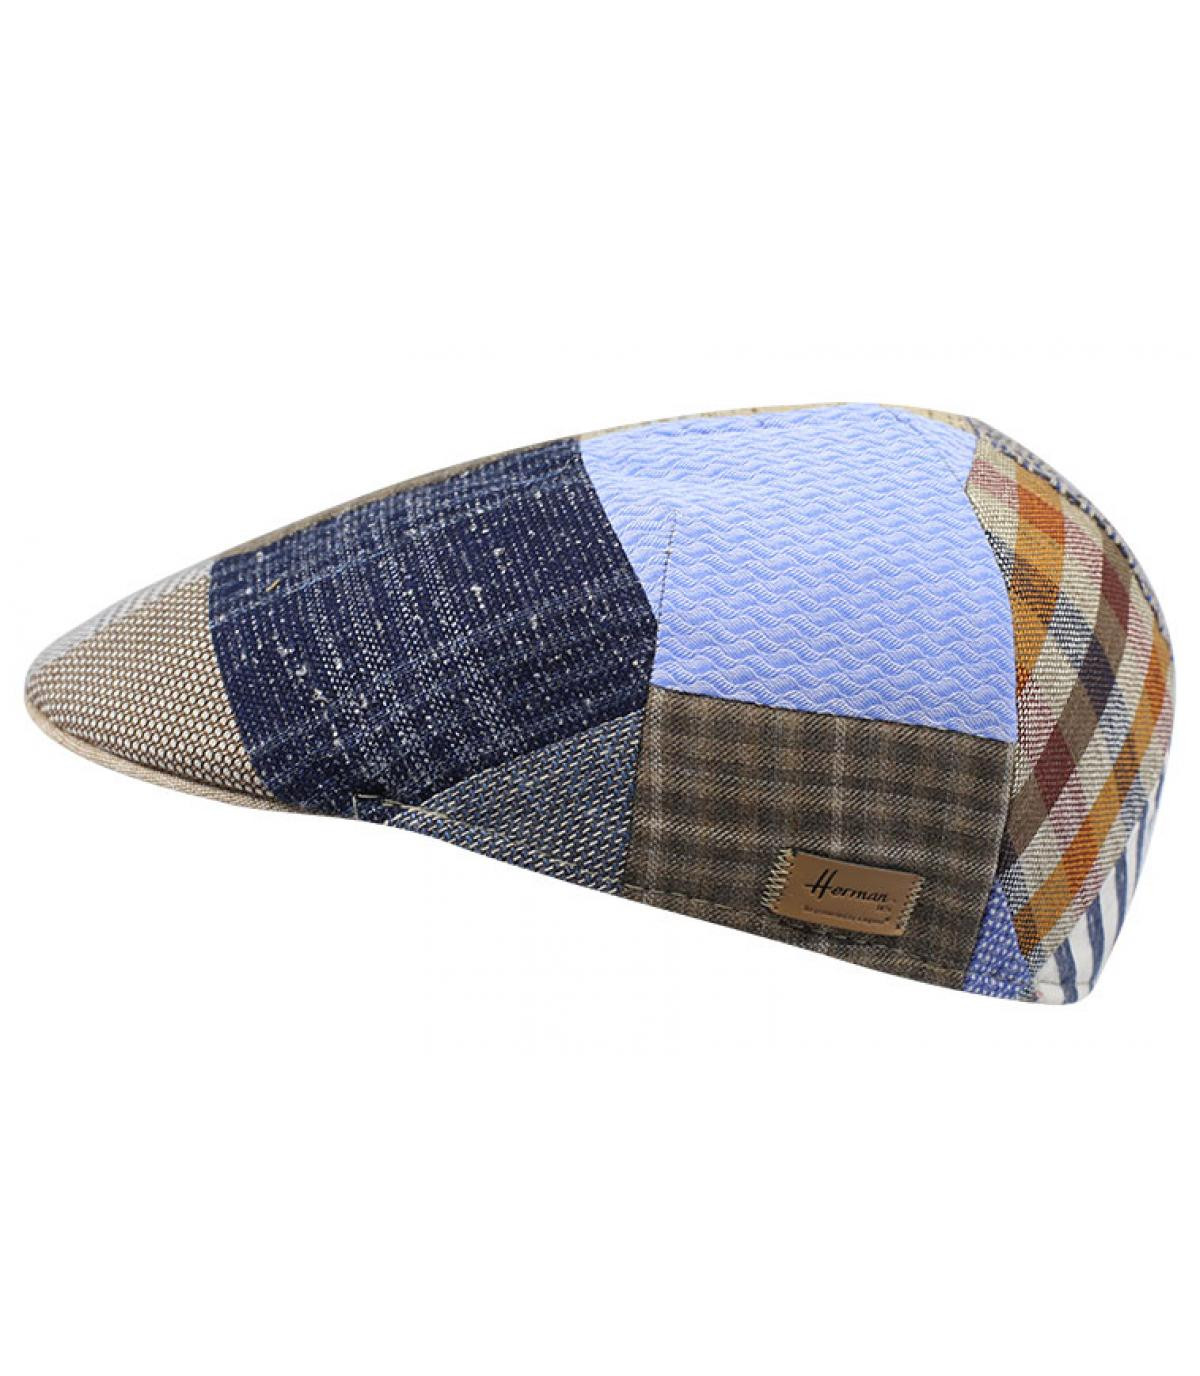 Cappellino piatto patchwork